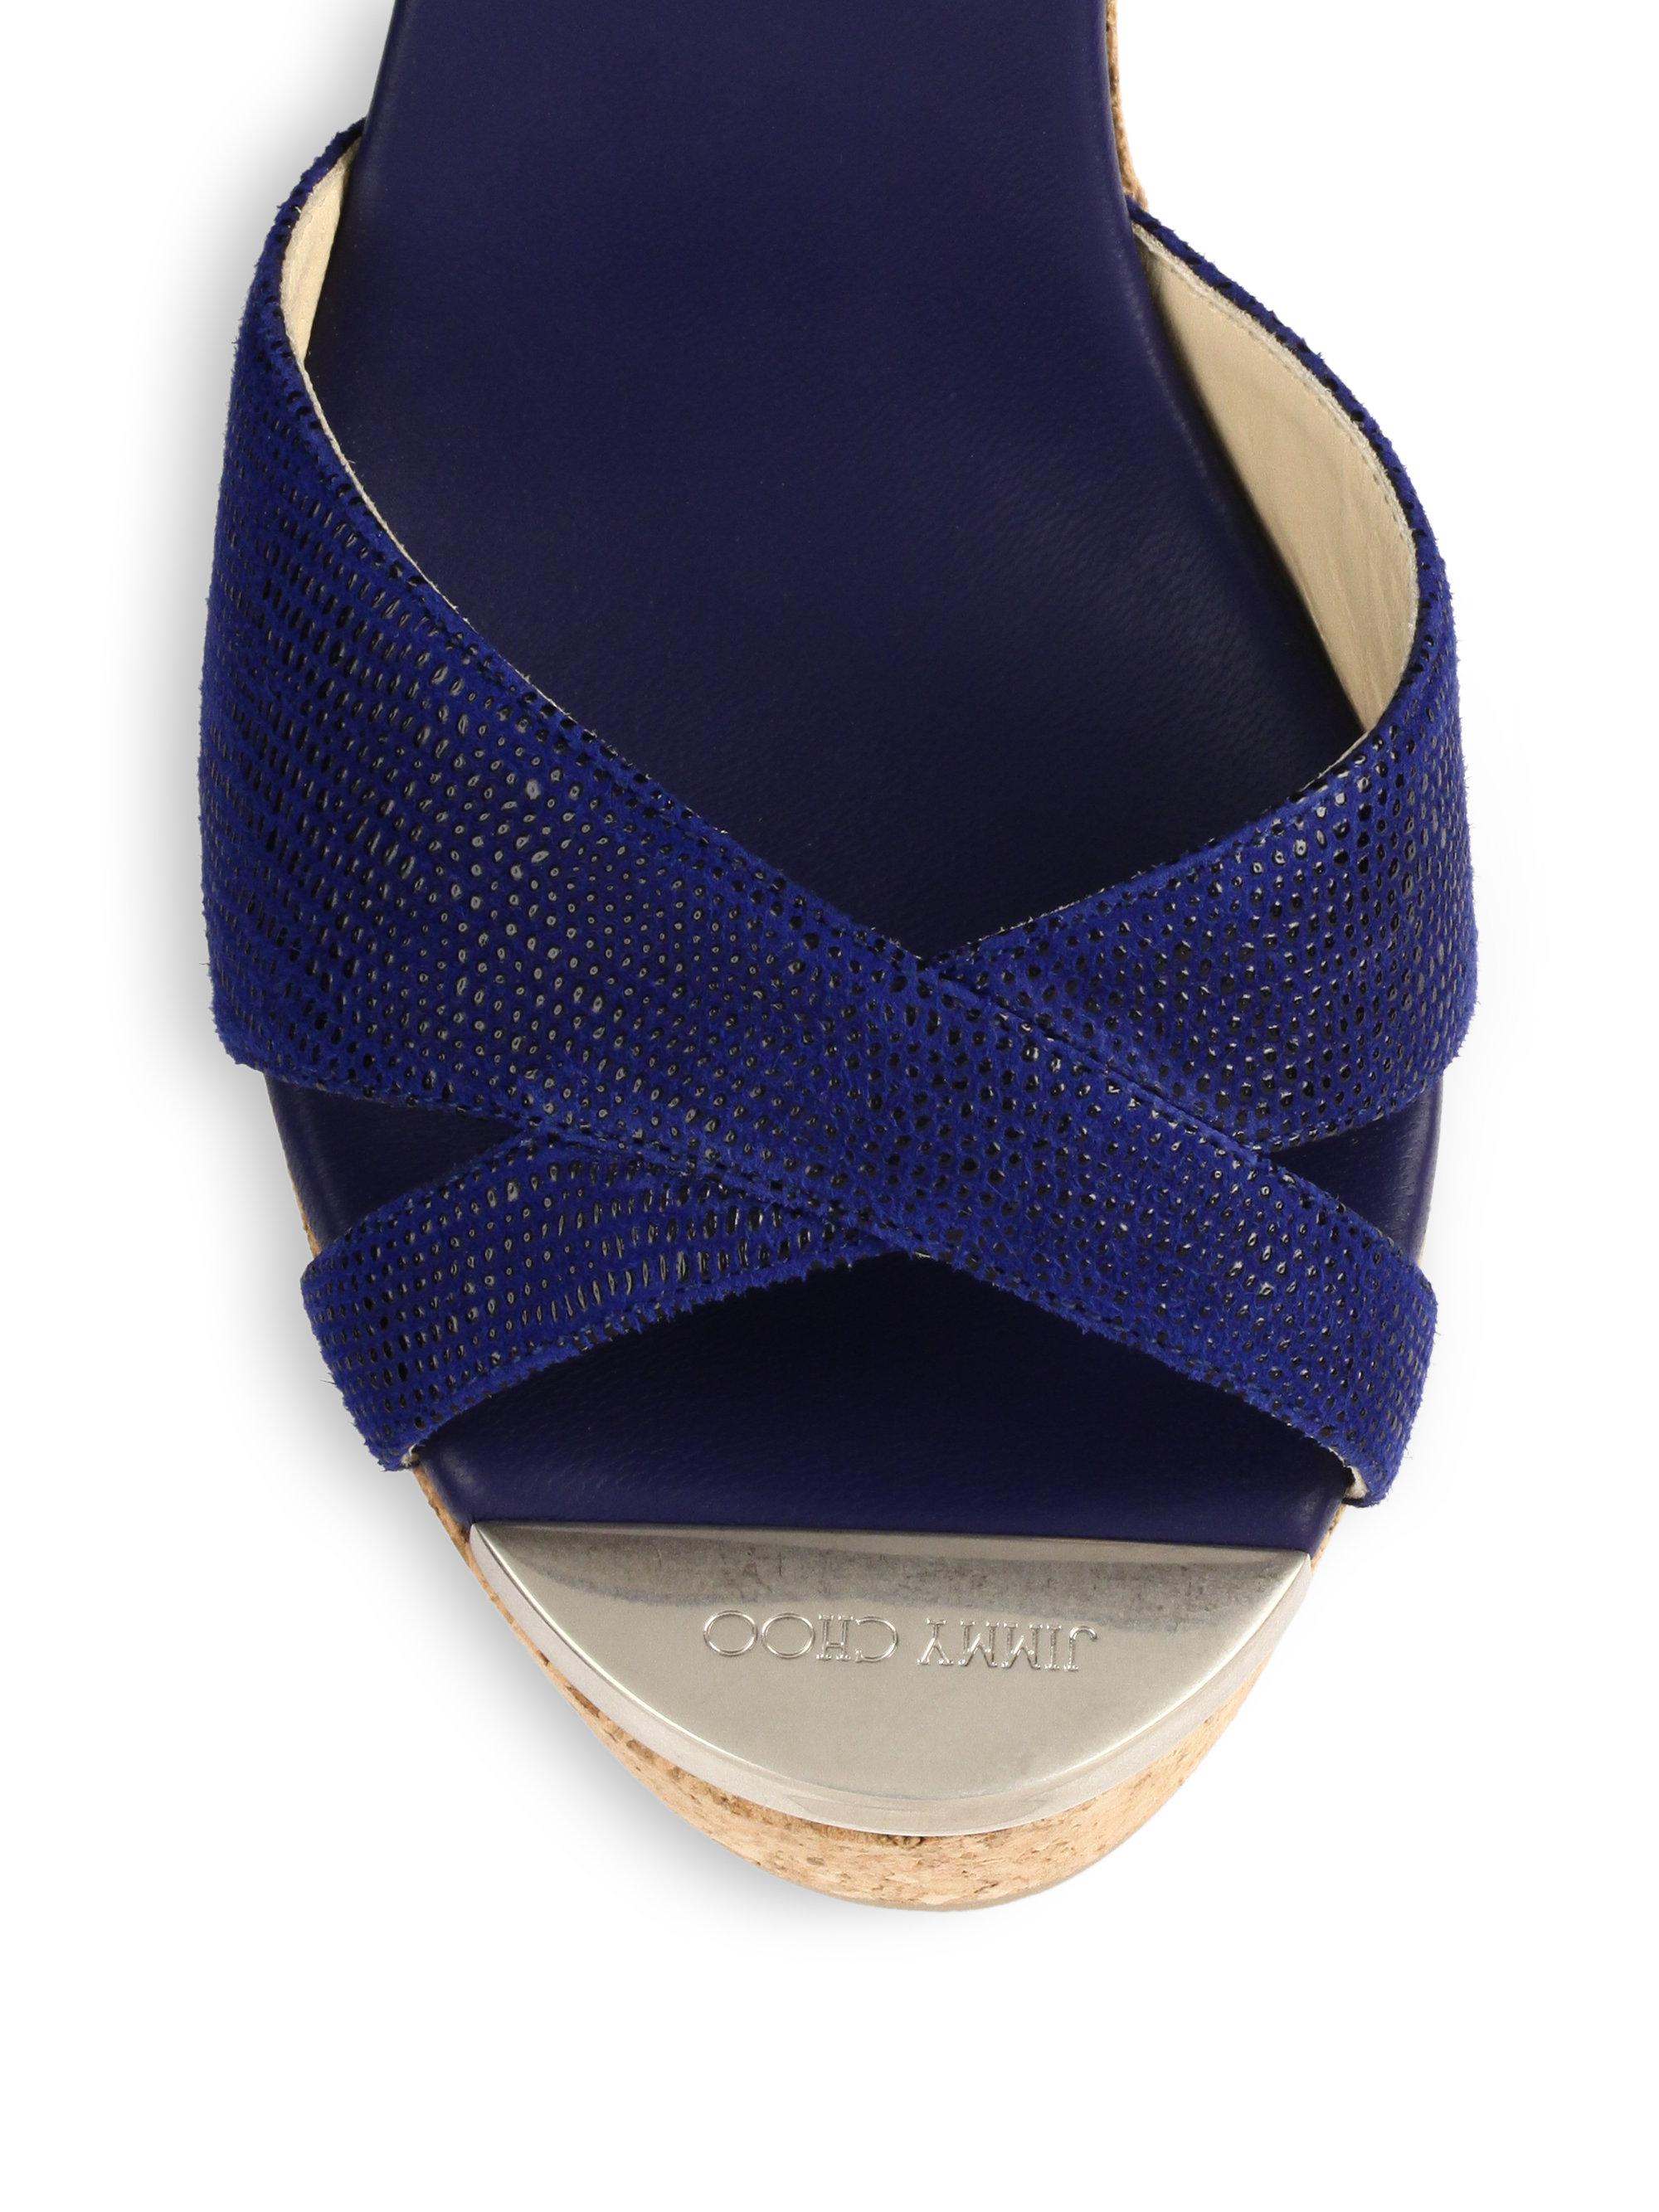 jimmy choo perfume leather cork wedge sandals in blue lyst